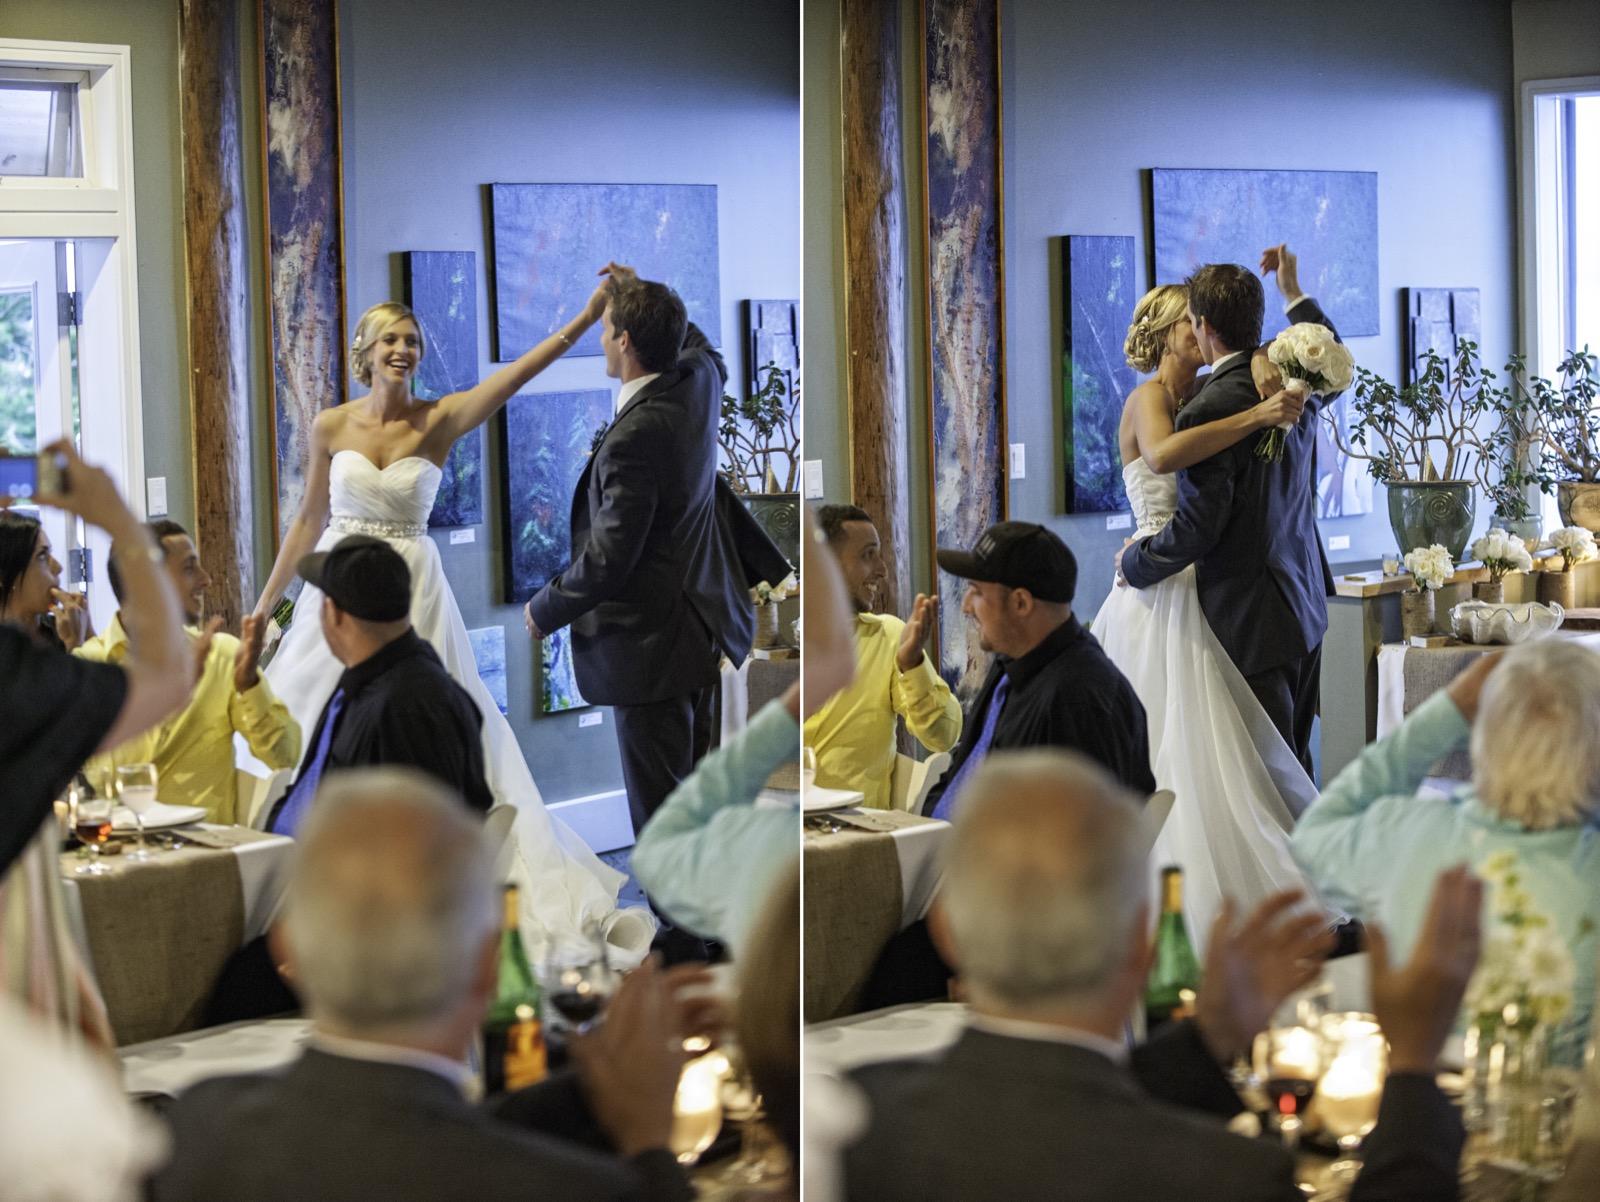 sooke-wedding-photographers-craidelonna-oceanedge-lodge-wedding-82.jpg